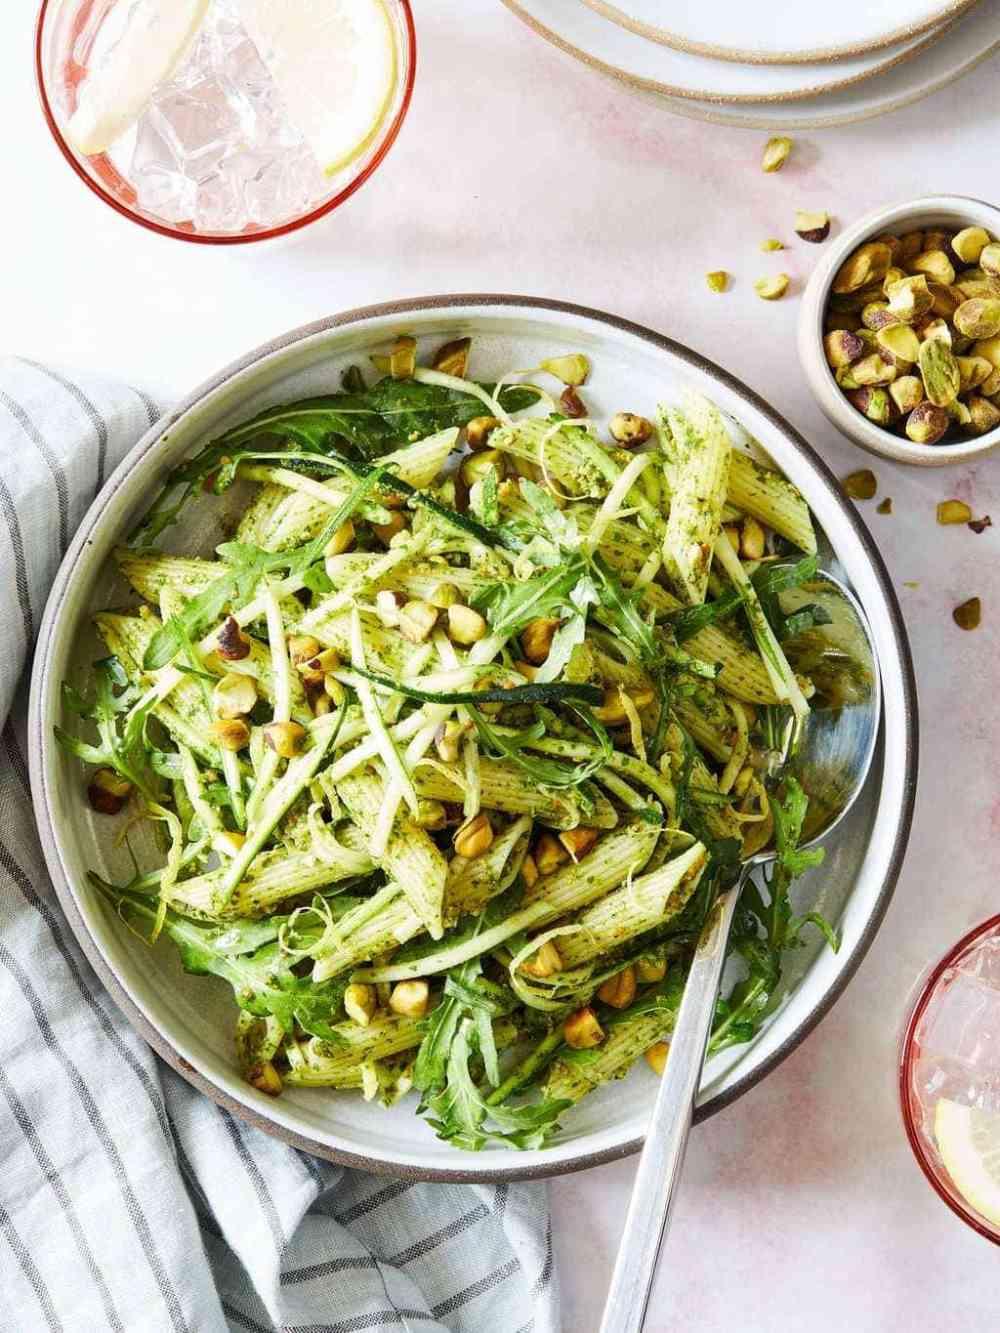 Close up of pistachio pesto pasta with green pistachios